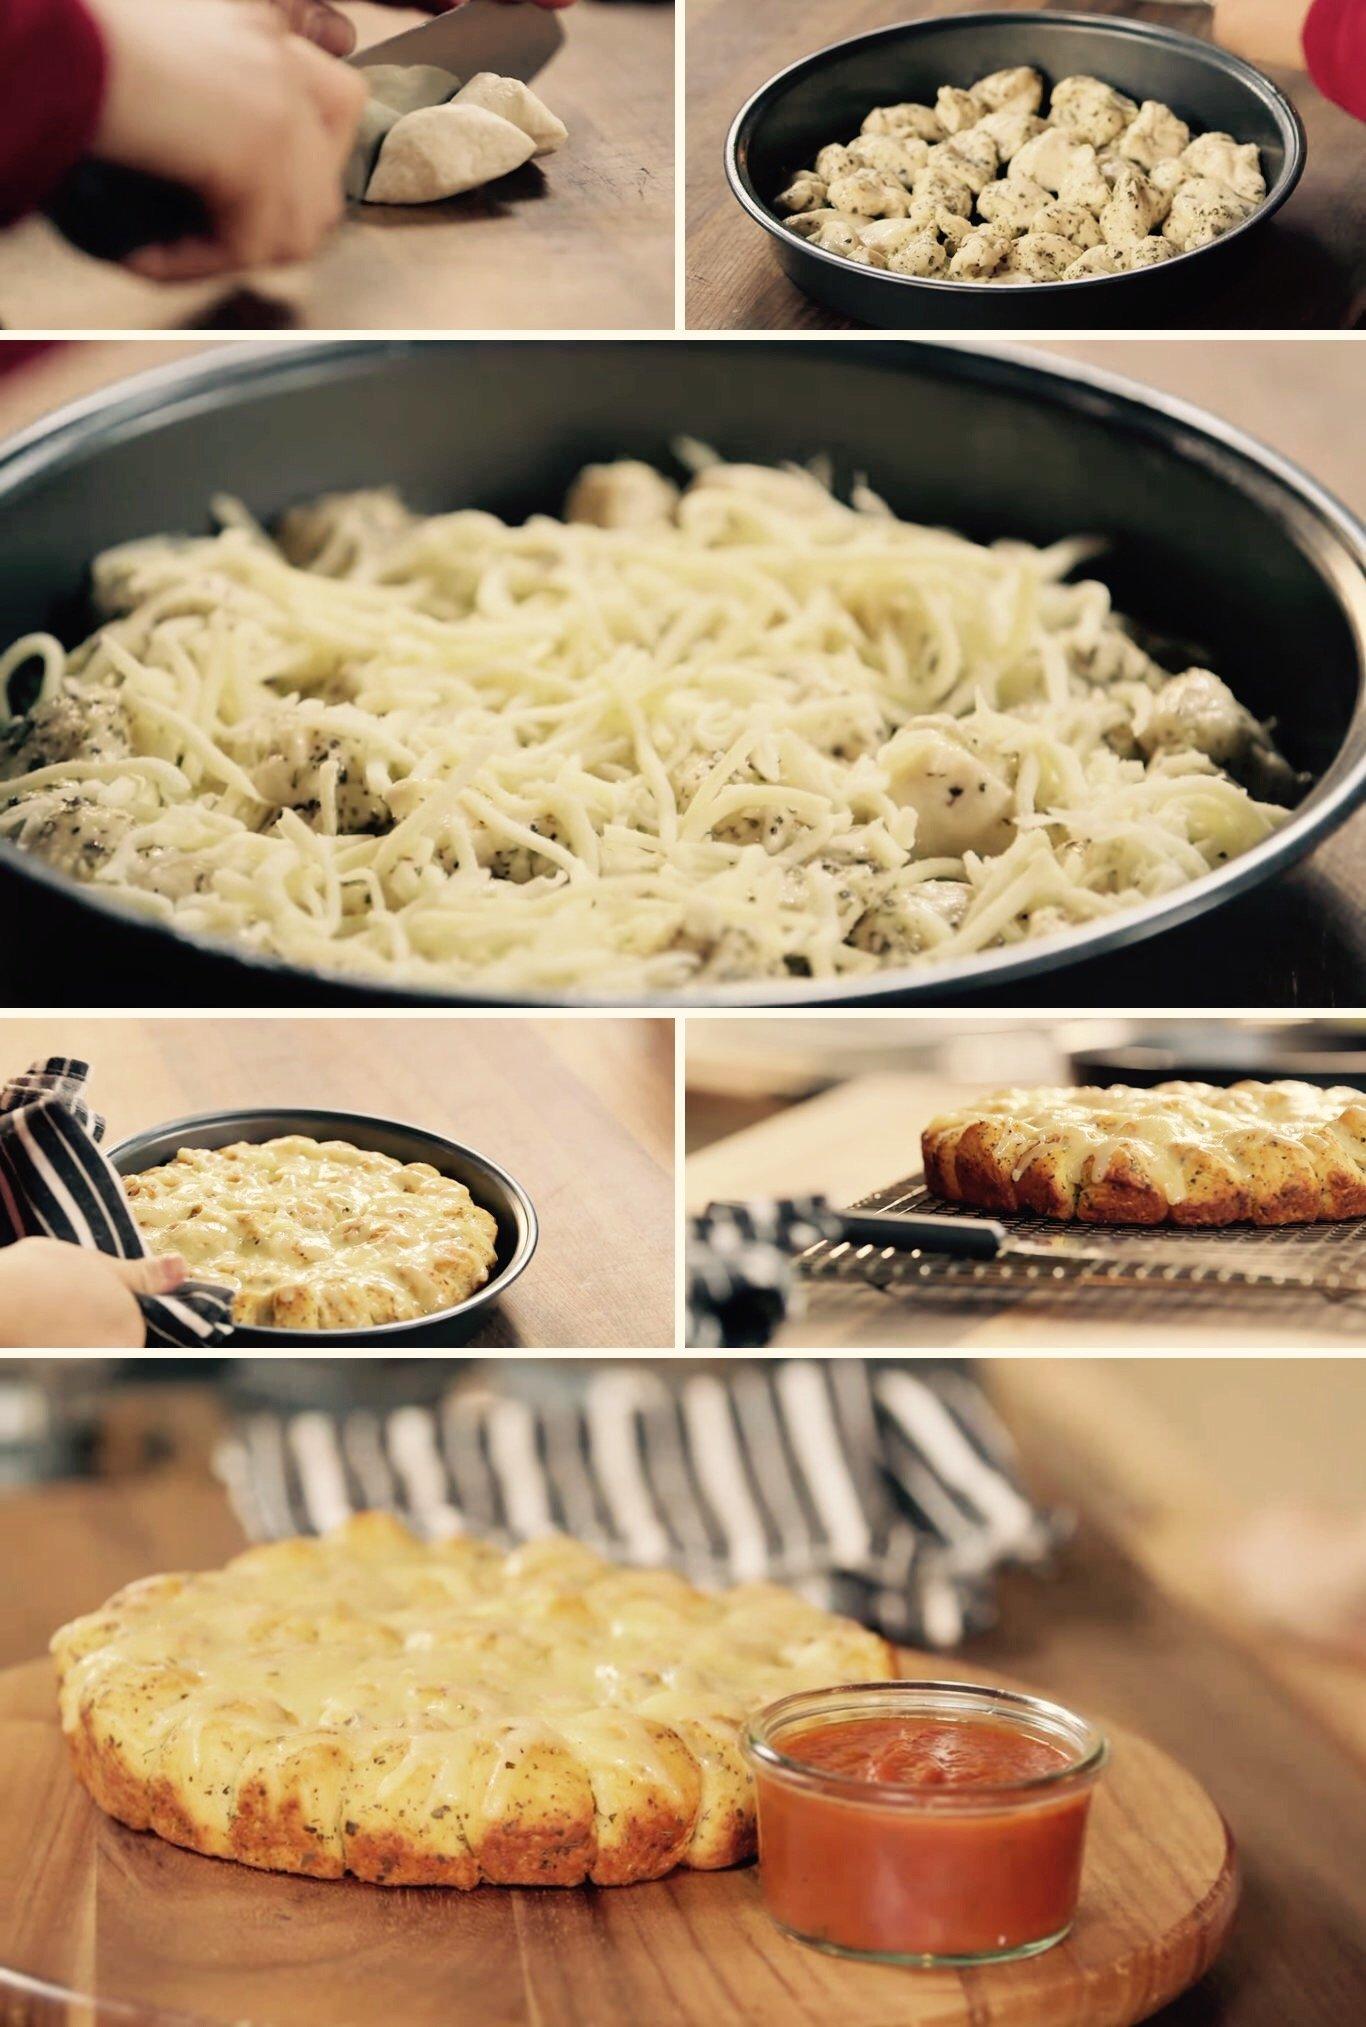 Tasty parmesan garlic bread Quick & Easy Way to Make Lip smacking Parmesan Garlic Monkey Bread